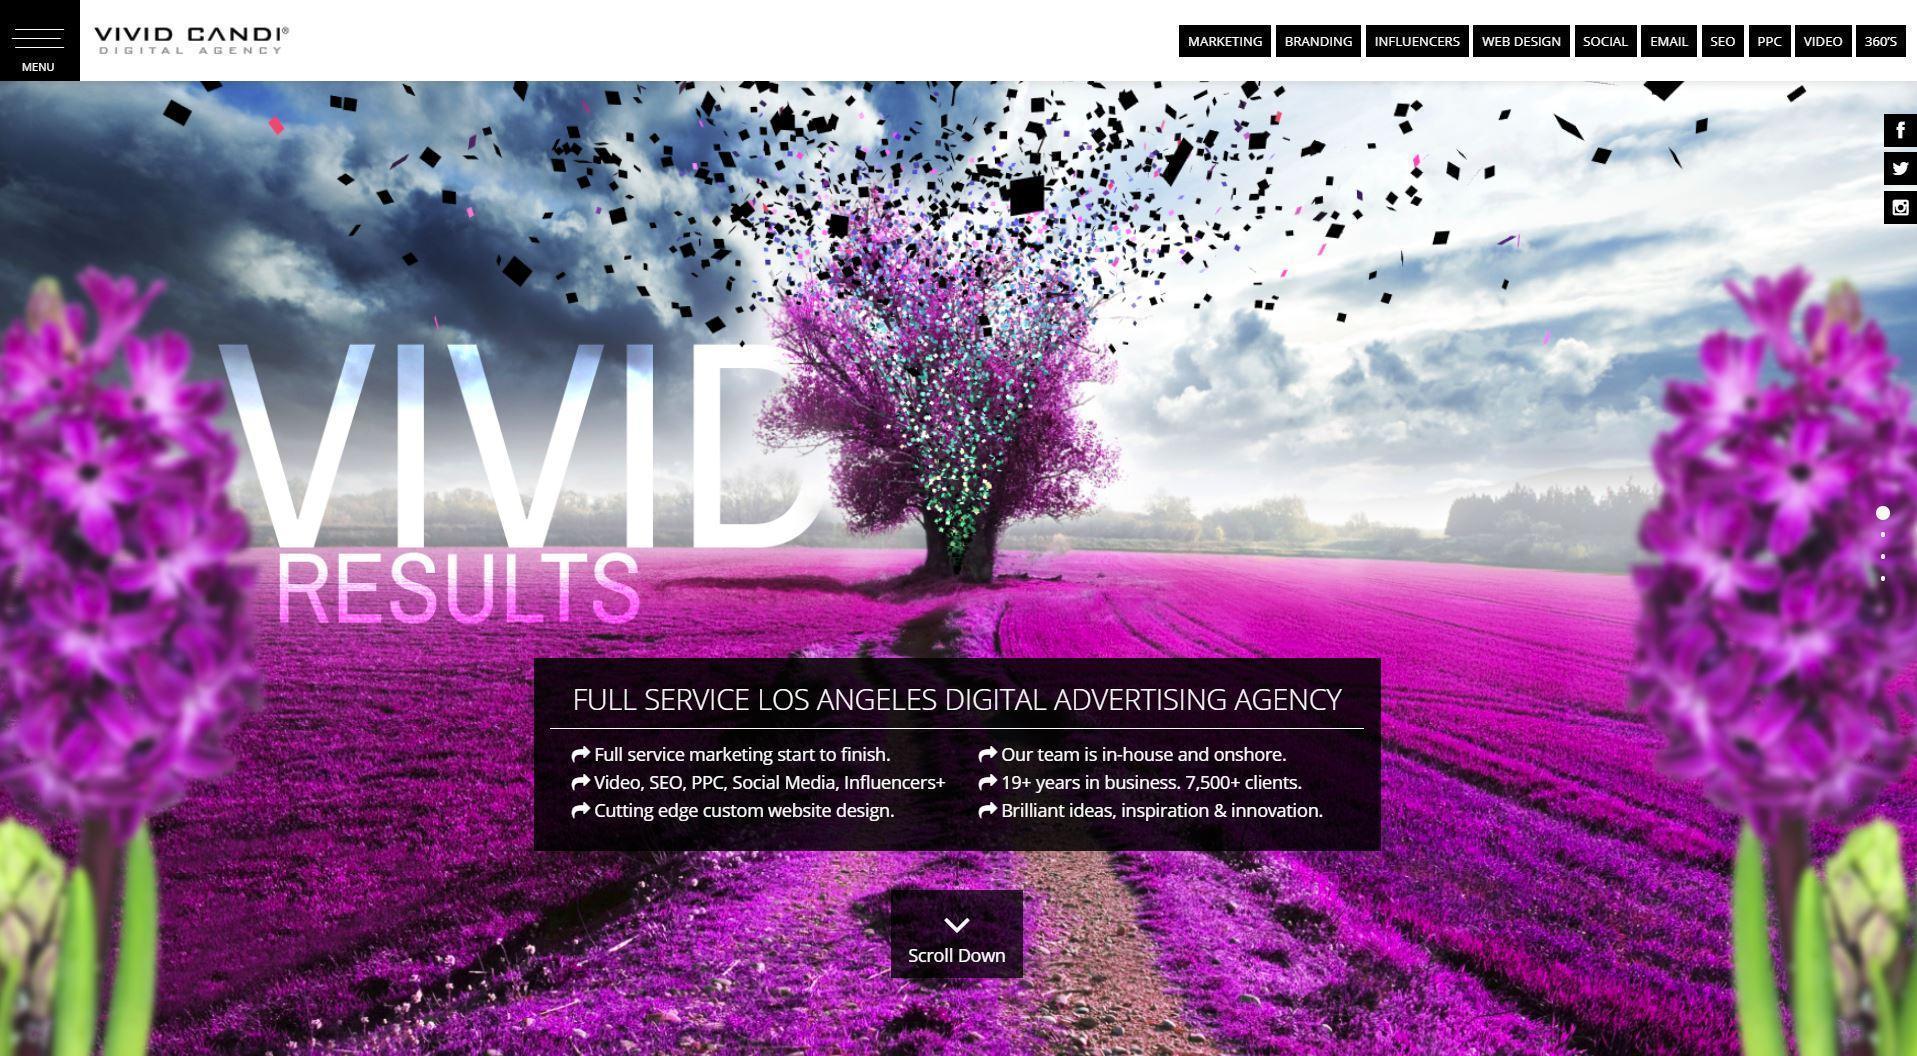 Los Angeles Digital Tech Agency :: Vivid Candi